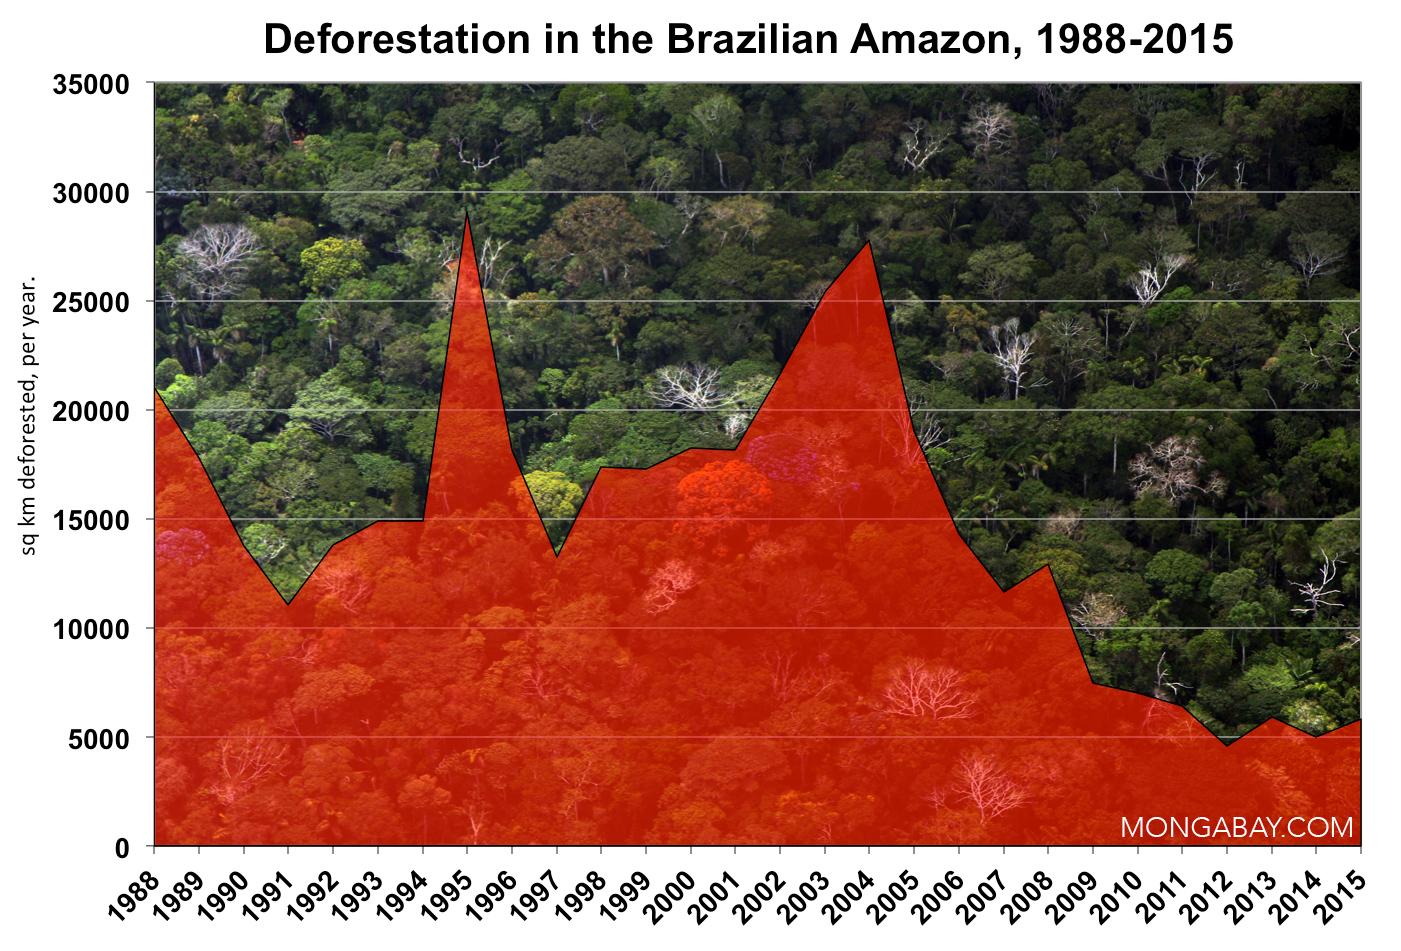 Deforestation in the Brazilian Amazon since 1988